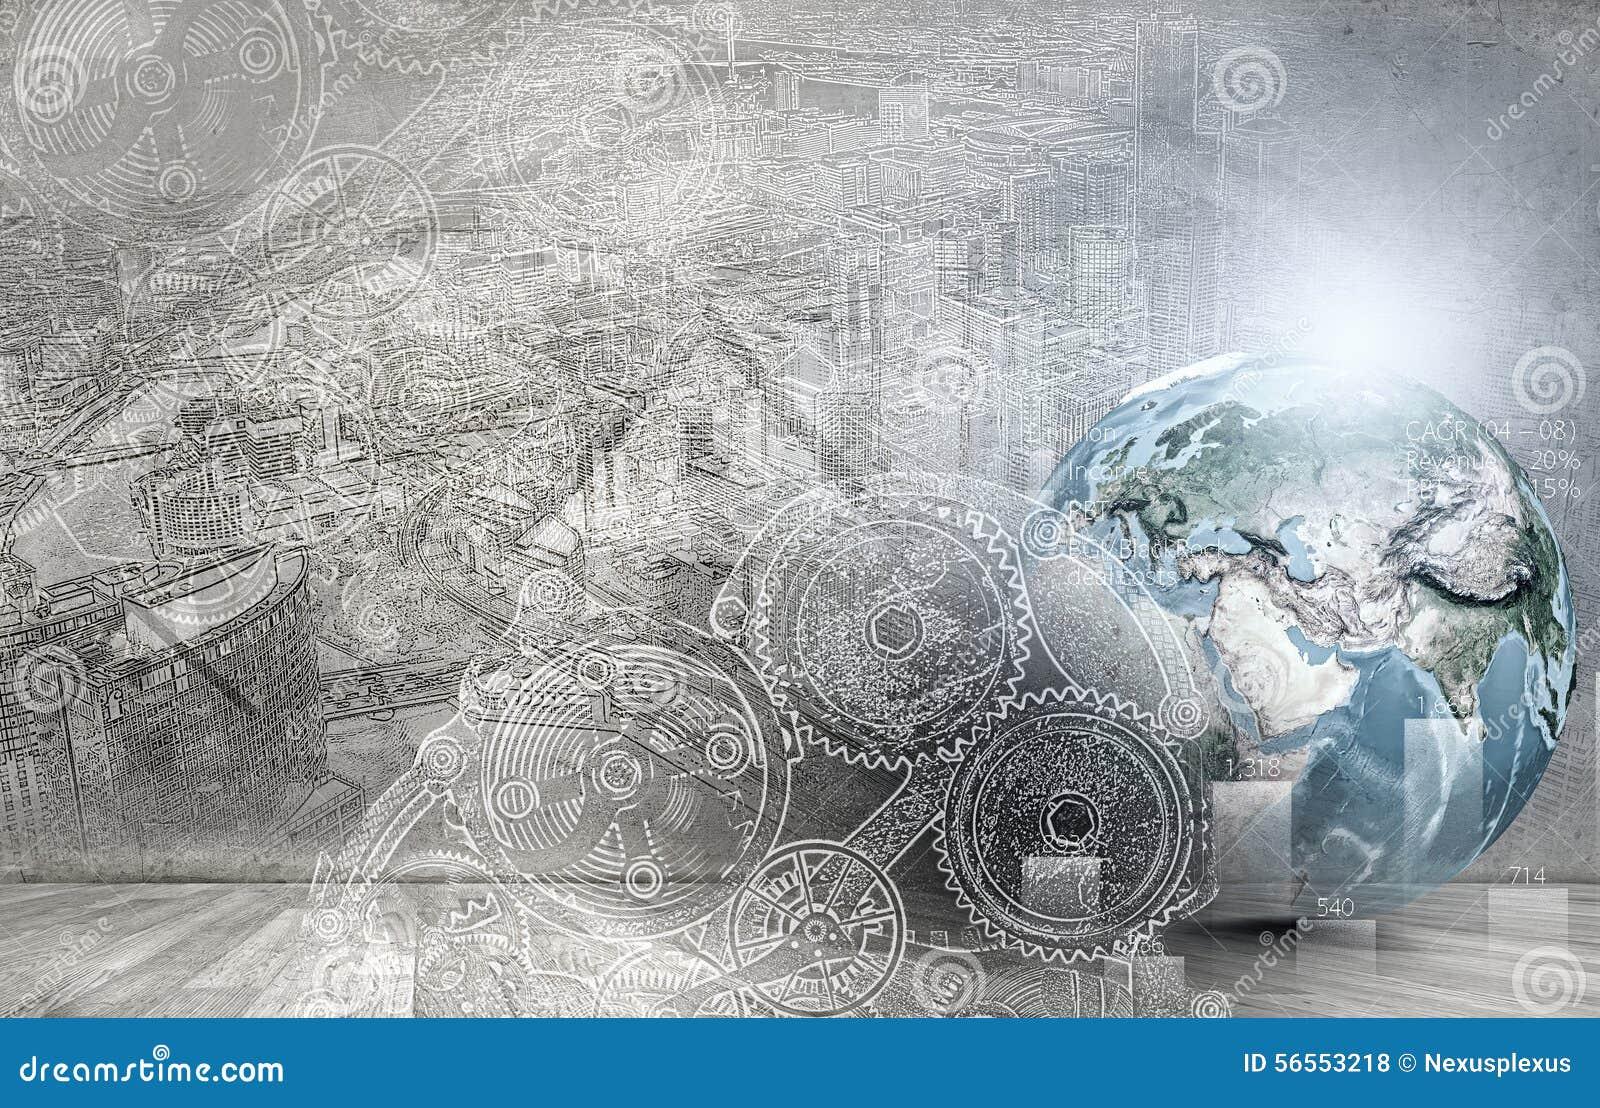 Download Σύνδεση υπολογισμού στοκ εικόνες. εικόνα από παγκοσμίως - 56553218